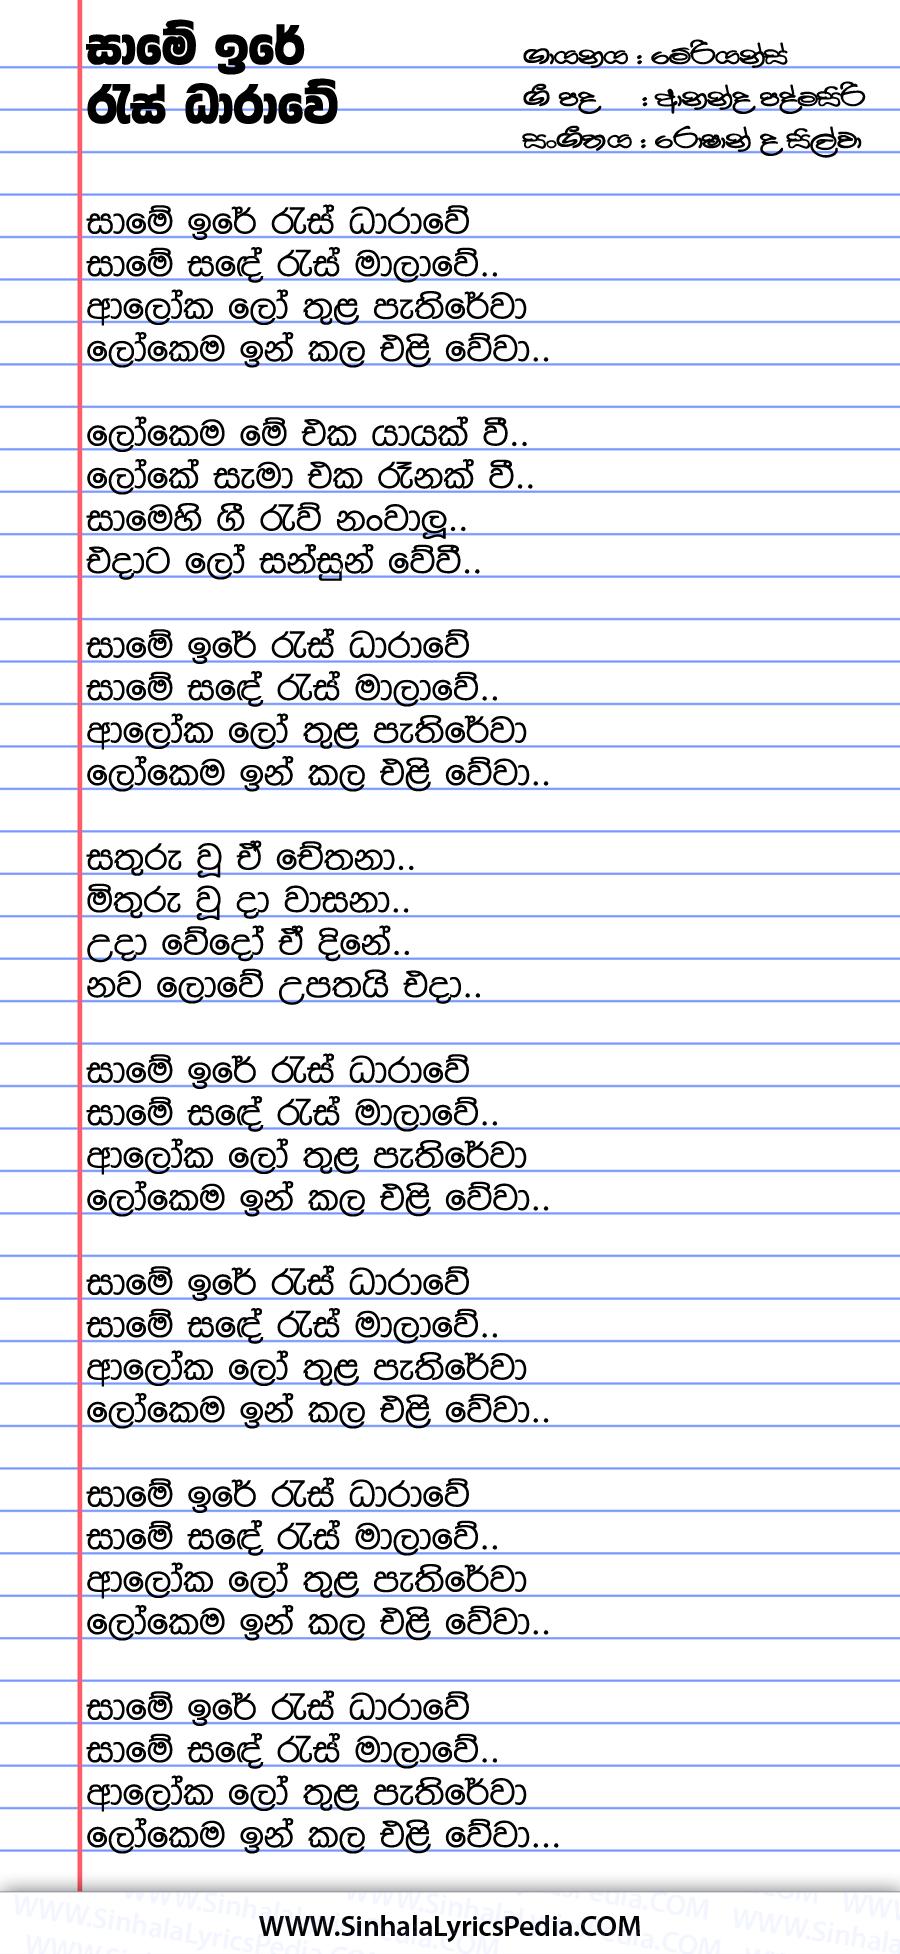 Same Ire Ras Darawe Song Lyrics